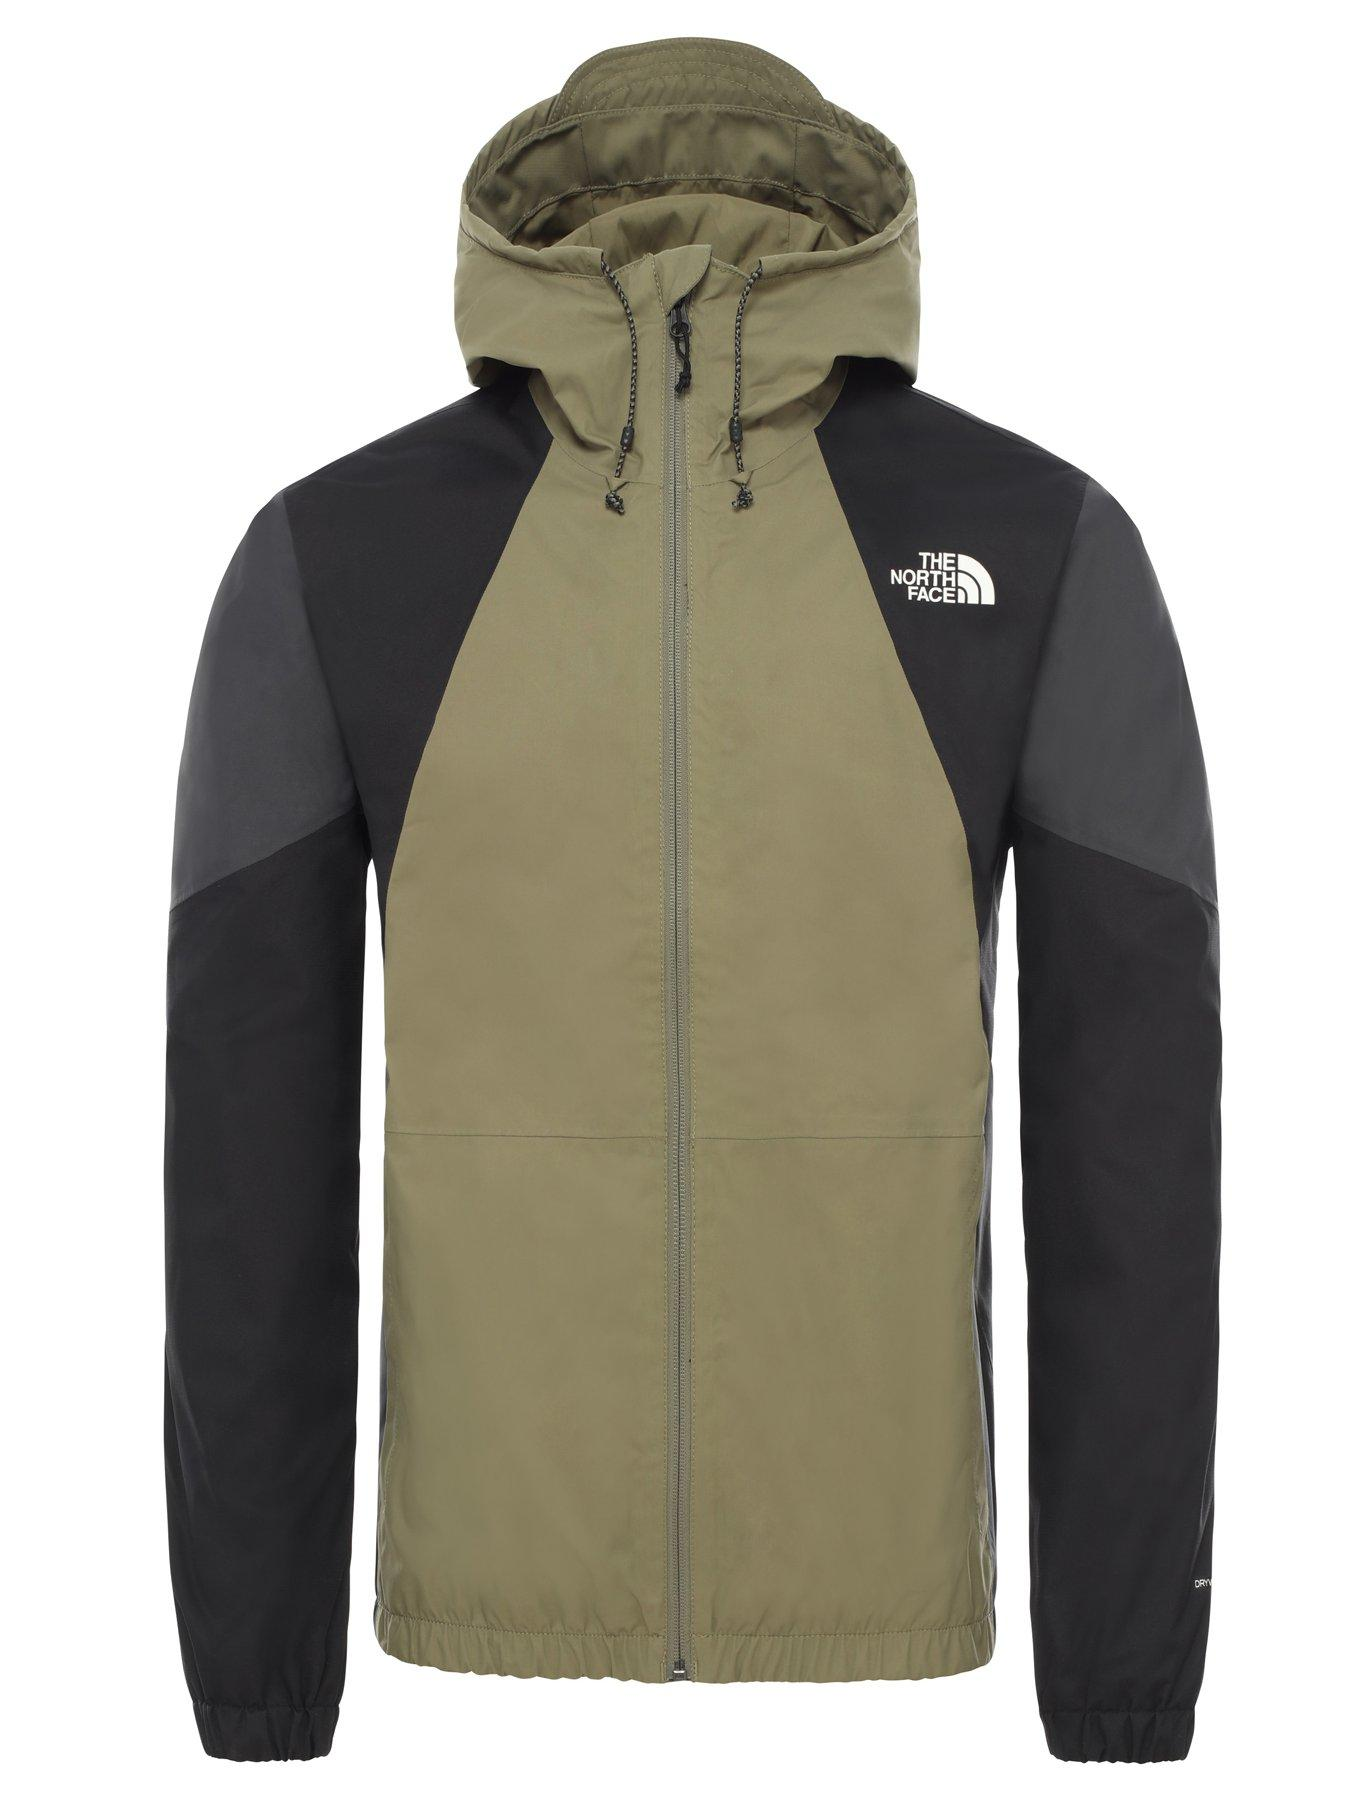 Game Boy Lightweight Mans Jacket with Hood Long Sleeved Zippered Outwear